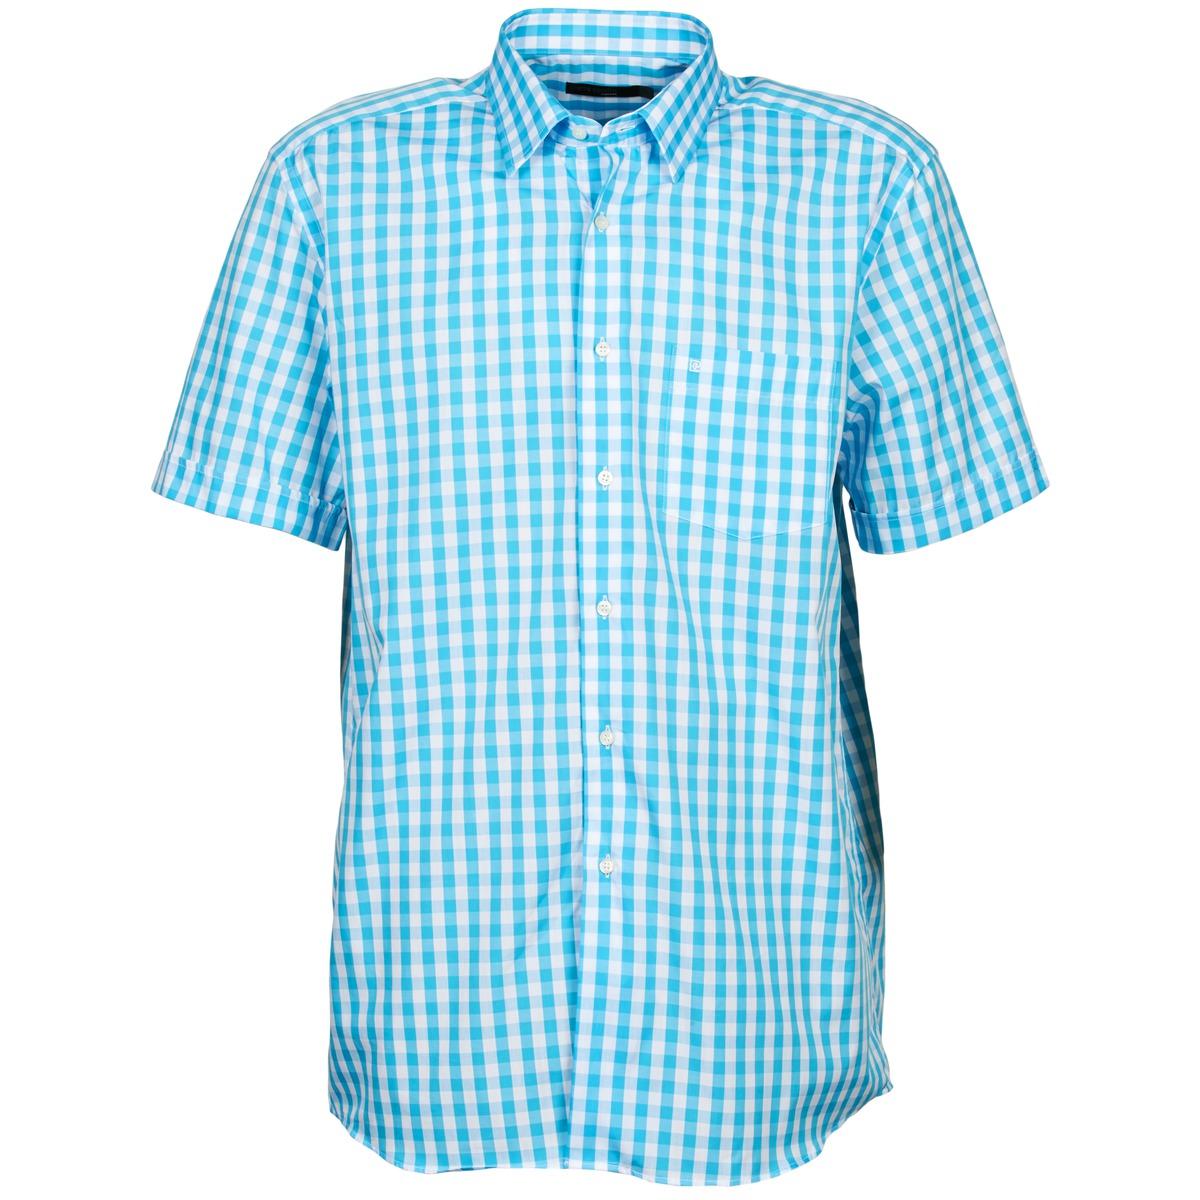 Pierre Cardin 539236202-140 Bleu